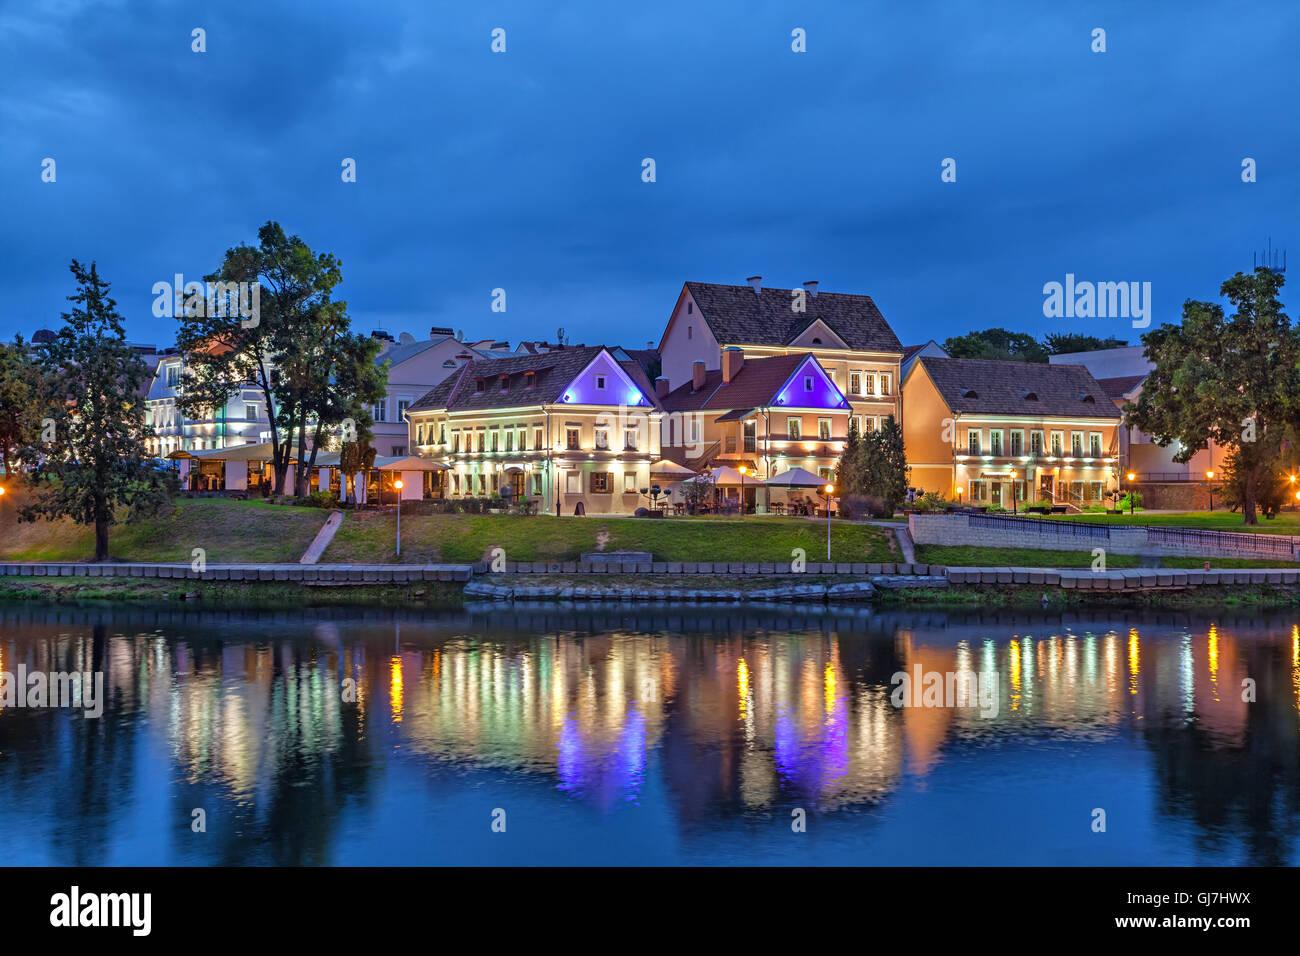 Trinity Hill (Trojeckaje Pradmiescie) -  the oldest district of Minsk, Belarus - Stock Image